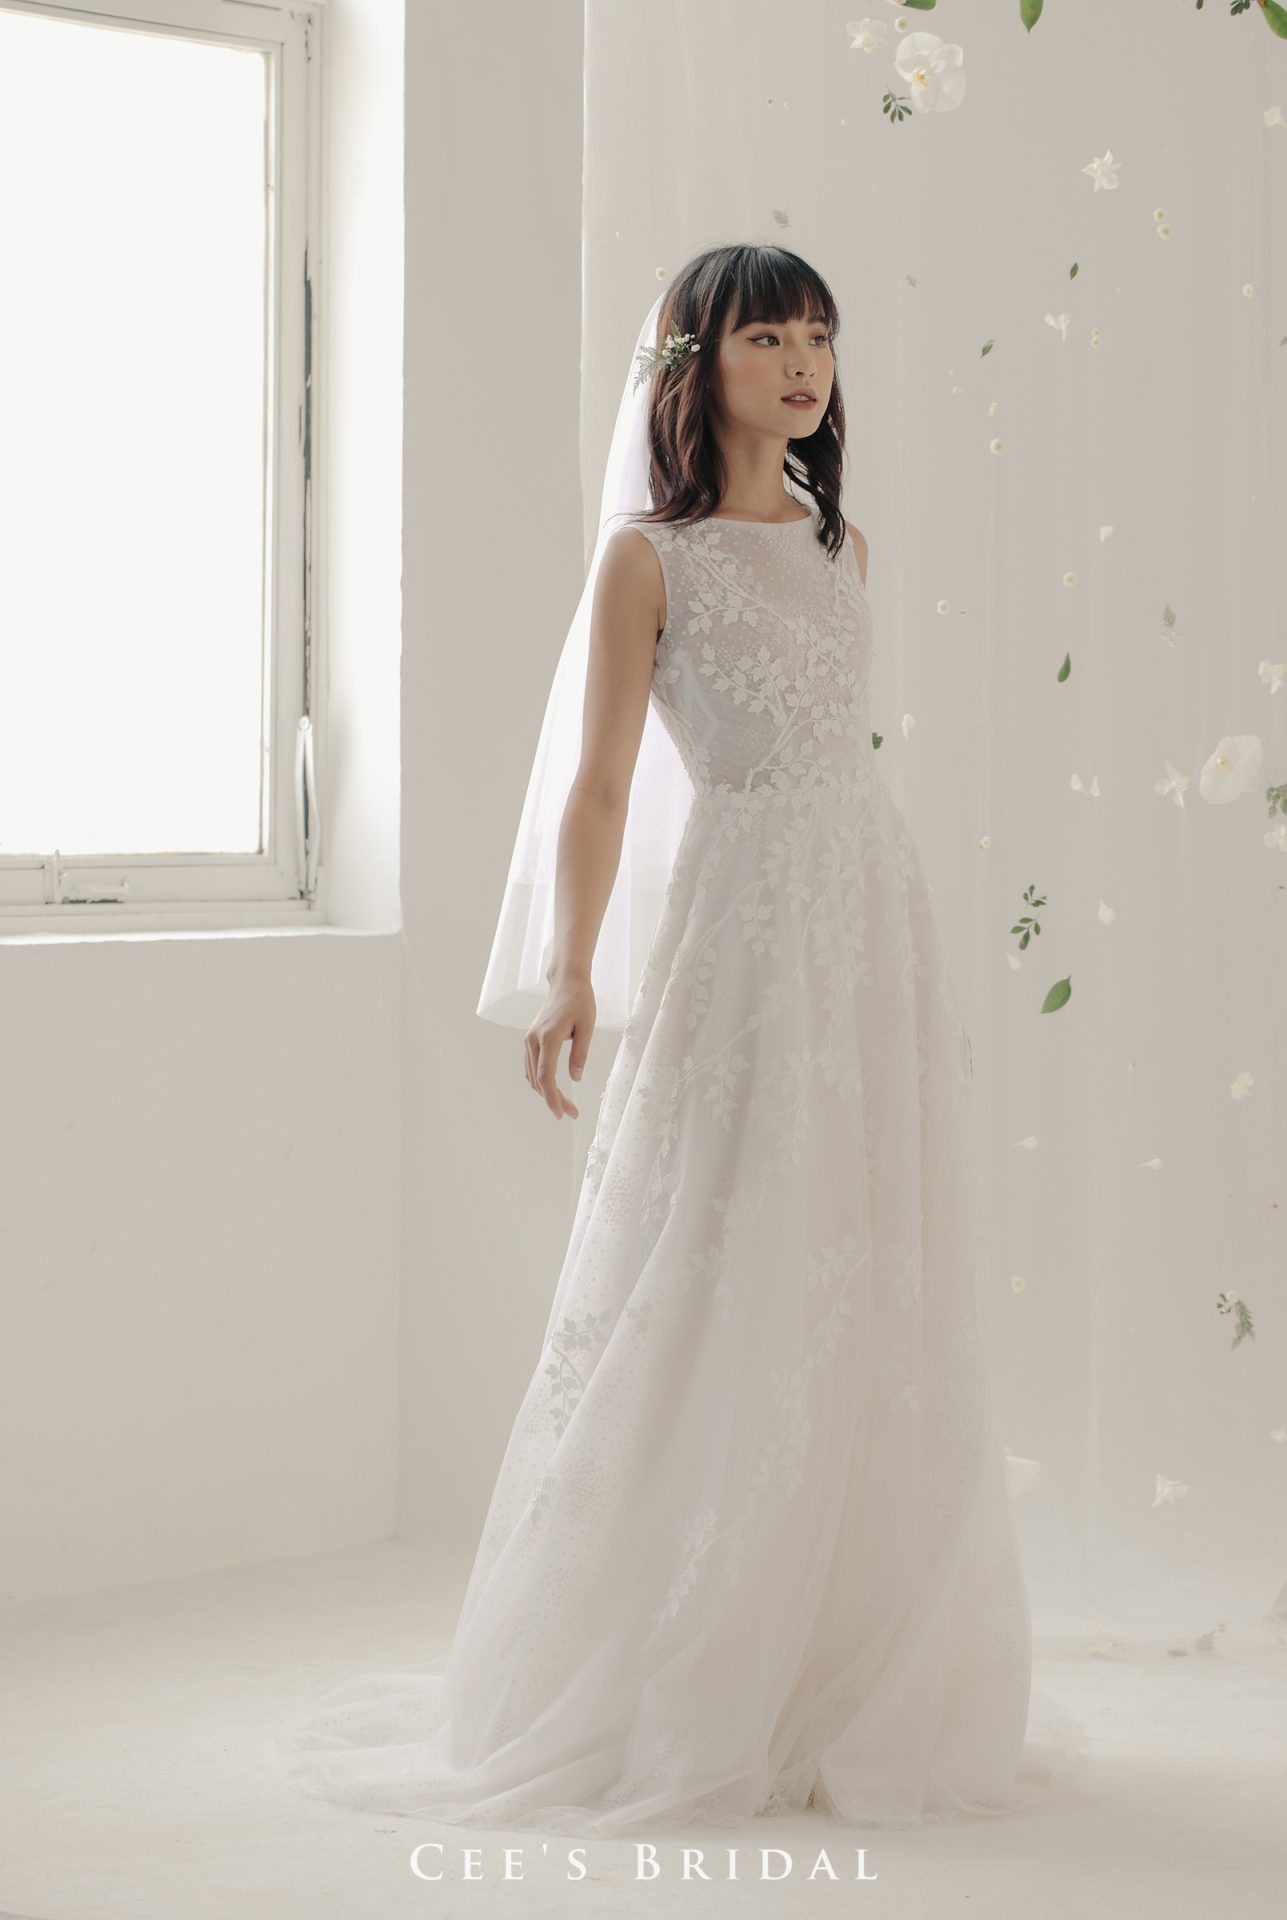 Myrtle Gown